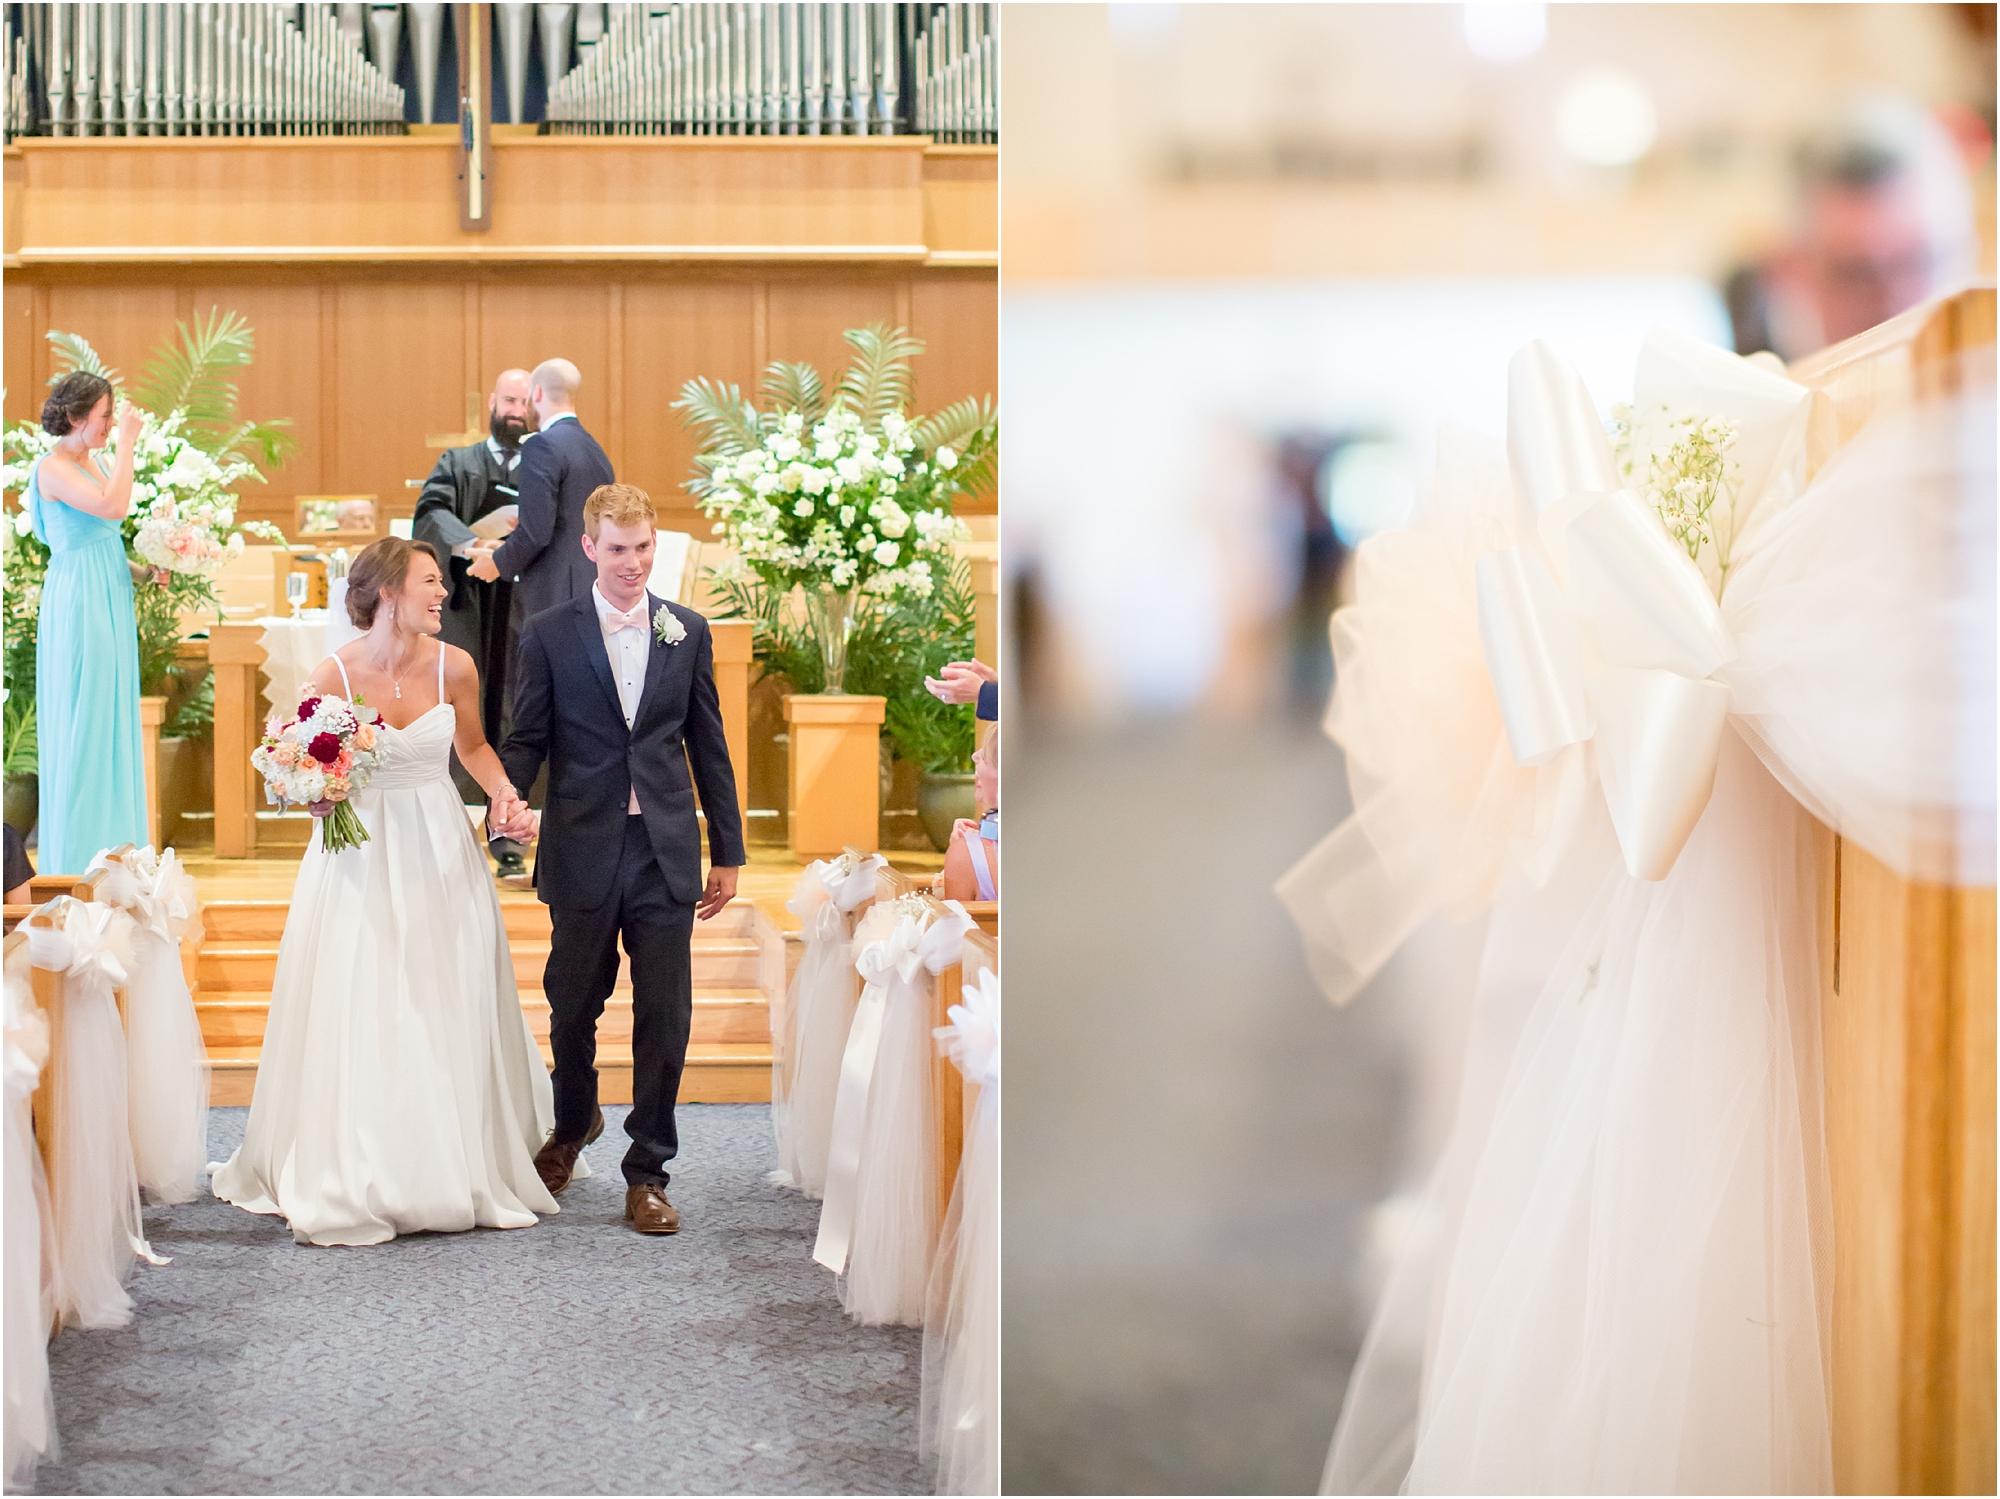 Russell 3-Ceremony-566_anna grace photography baltimore maryland wedding photographer elkridge furnace inn wedding photo.jpg